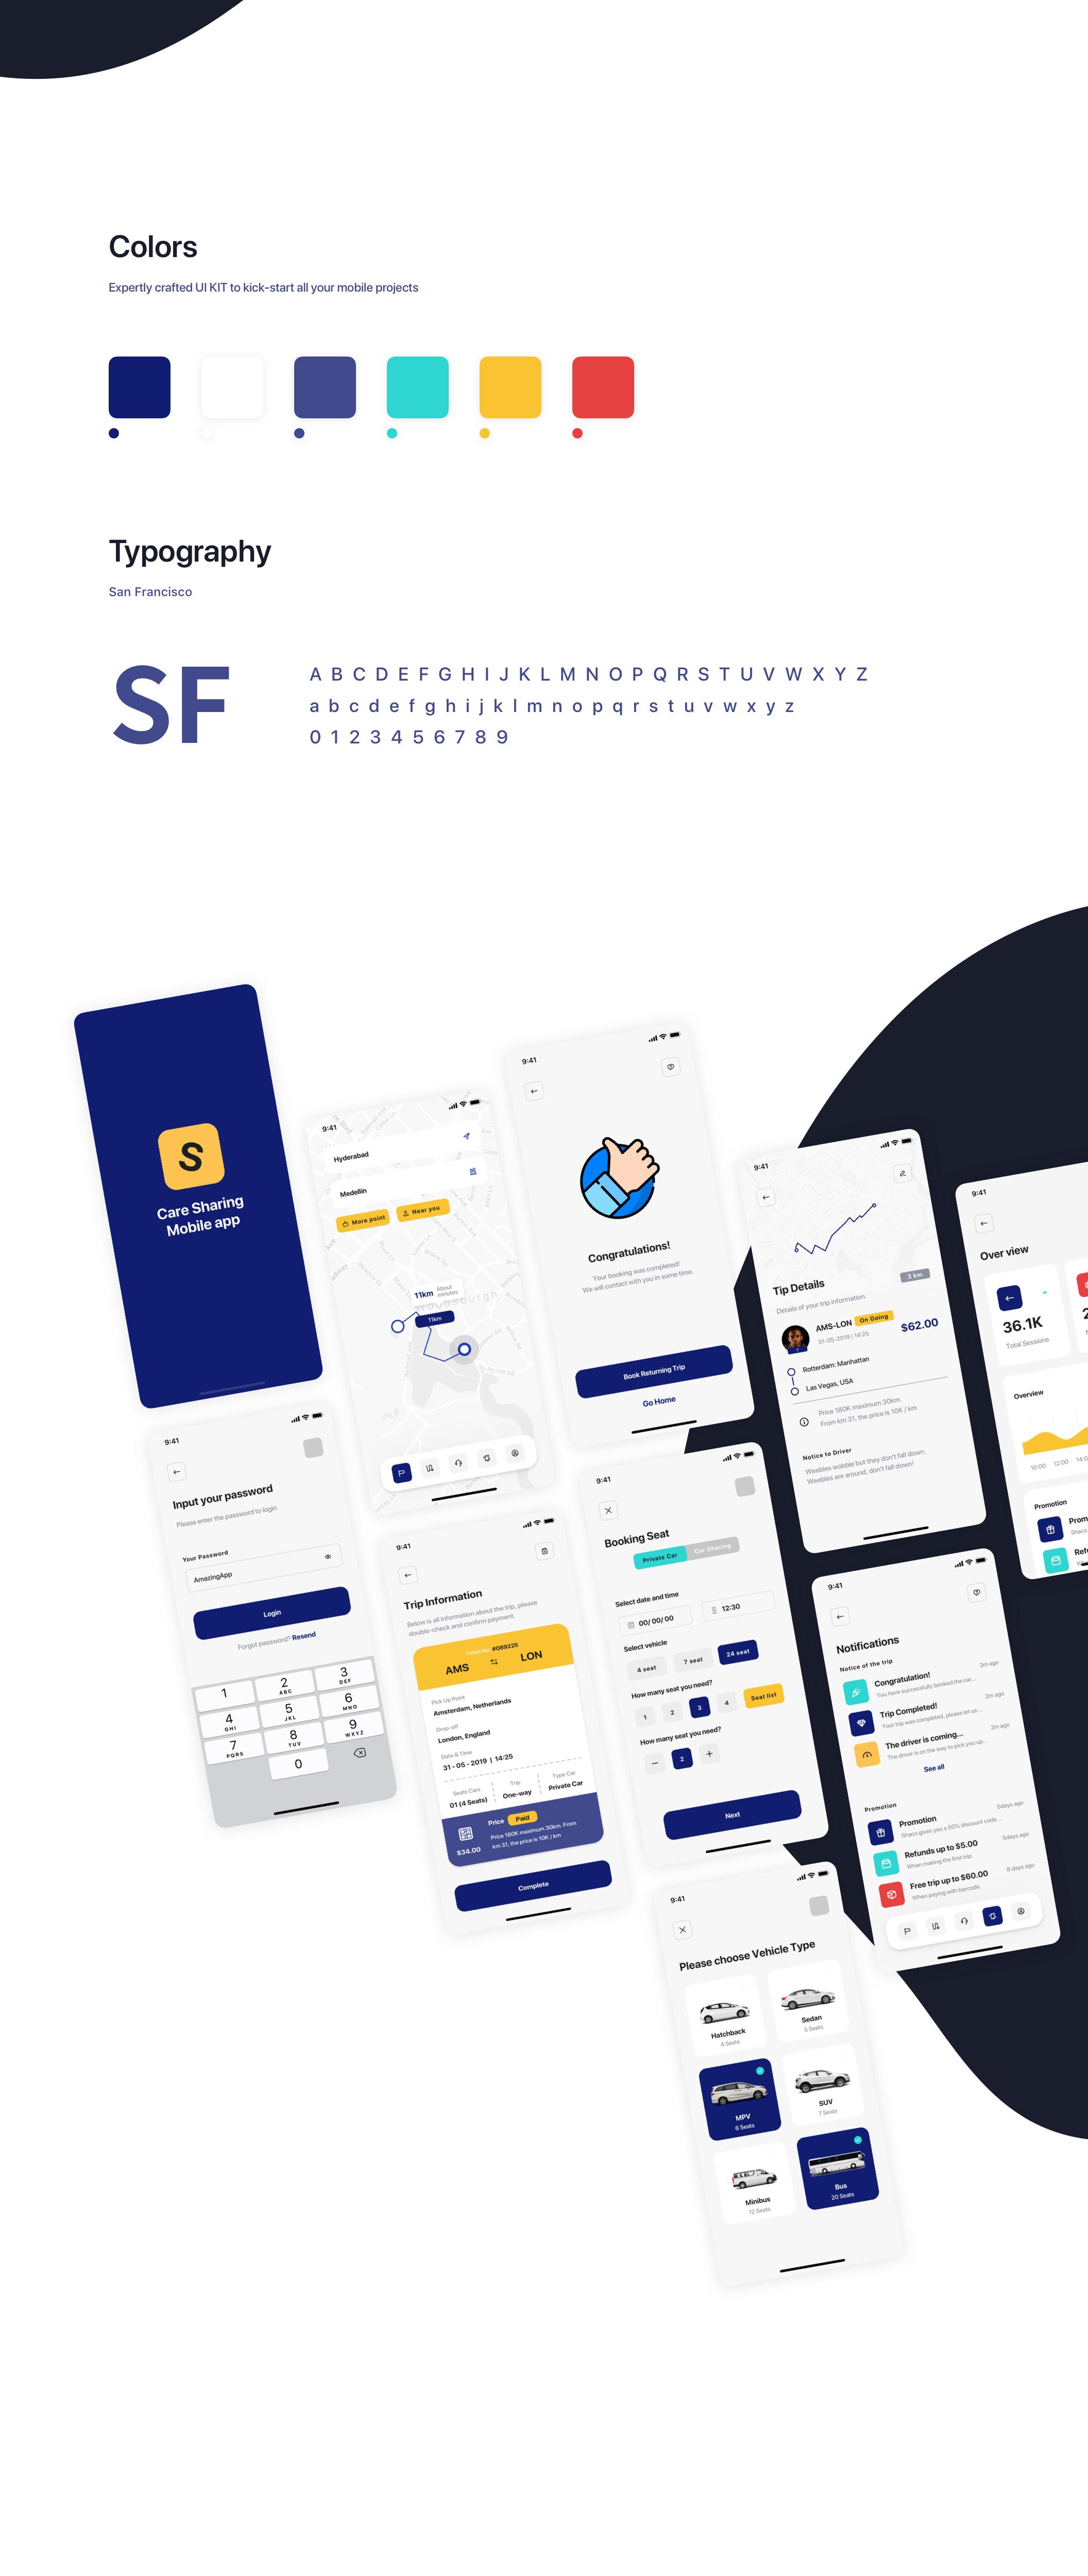 汽车租赁应用程序APP界面设计UI套件 Lydia – Car Booking & Sharing Mobile App UI Kit插图(1)